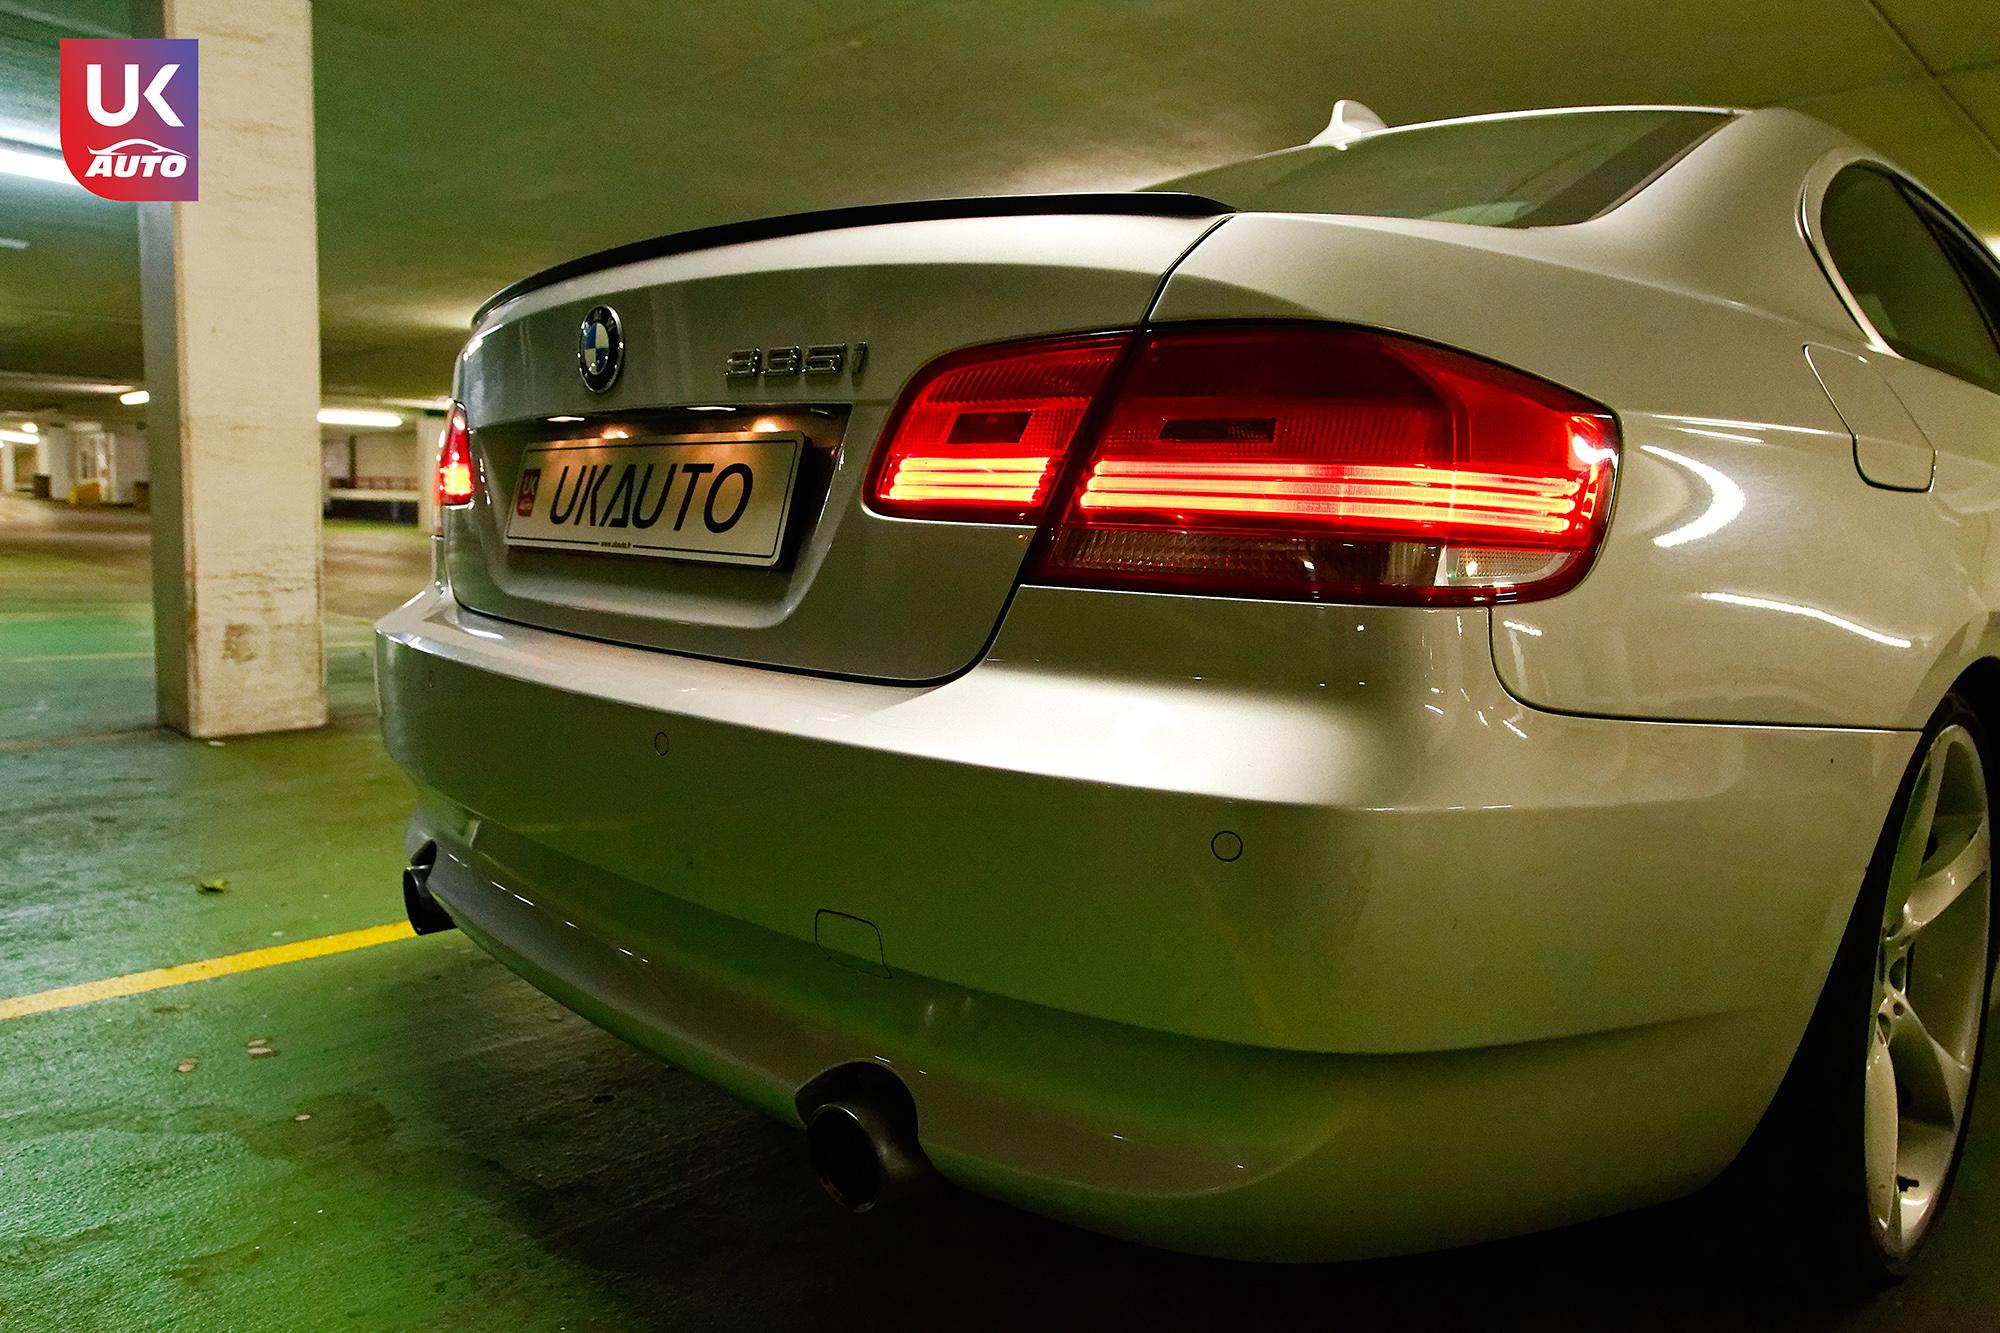 Bmw 335i rhd import uk bmw occasion bmw mandataire e92 rhd coupe uk auto uk ukauto8 - Felecitation a Julien pour cette BMW 335i E92 COUPE RHD importateur voitures anglaises